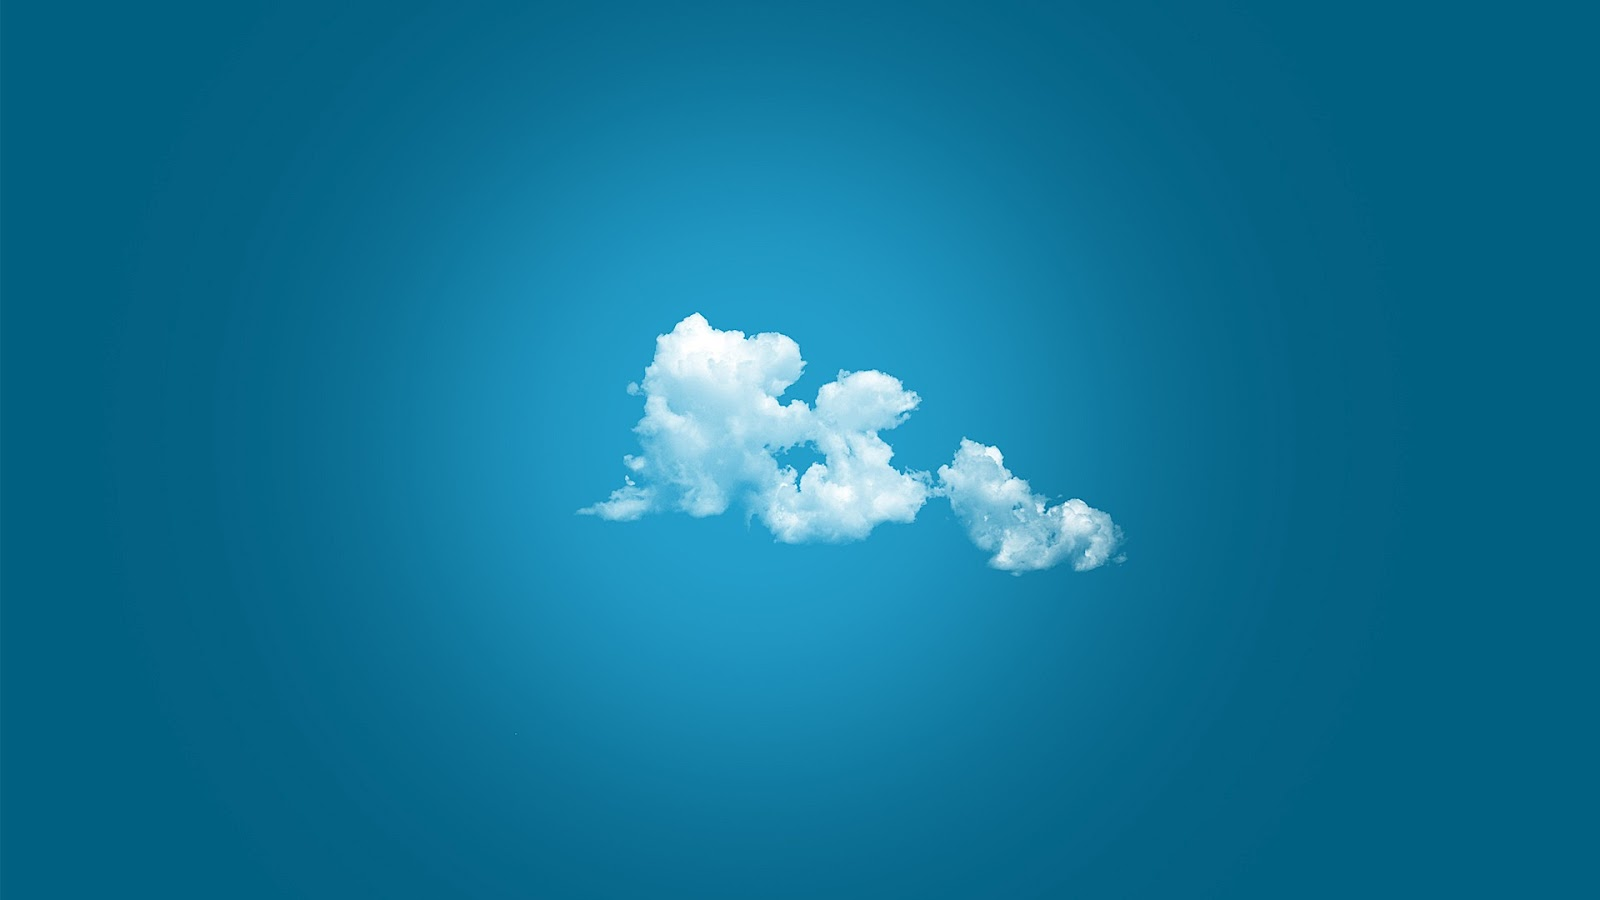 http://3.bp.blogspot.com/-jHmNyd_WYPo/UBKwx6C8kuI/AAAAAAAACBA/vuThSs9Ggxo/s1600/cloud+minimalistic.jpg